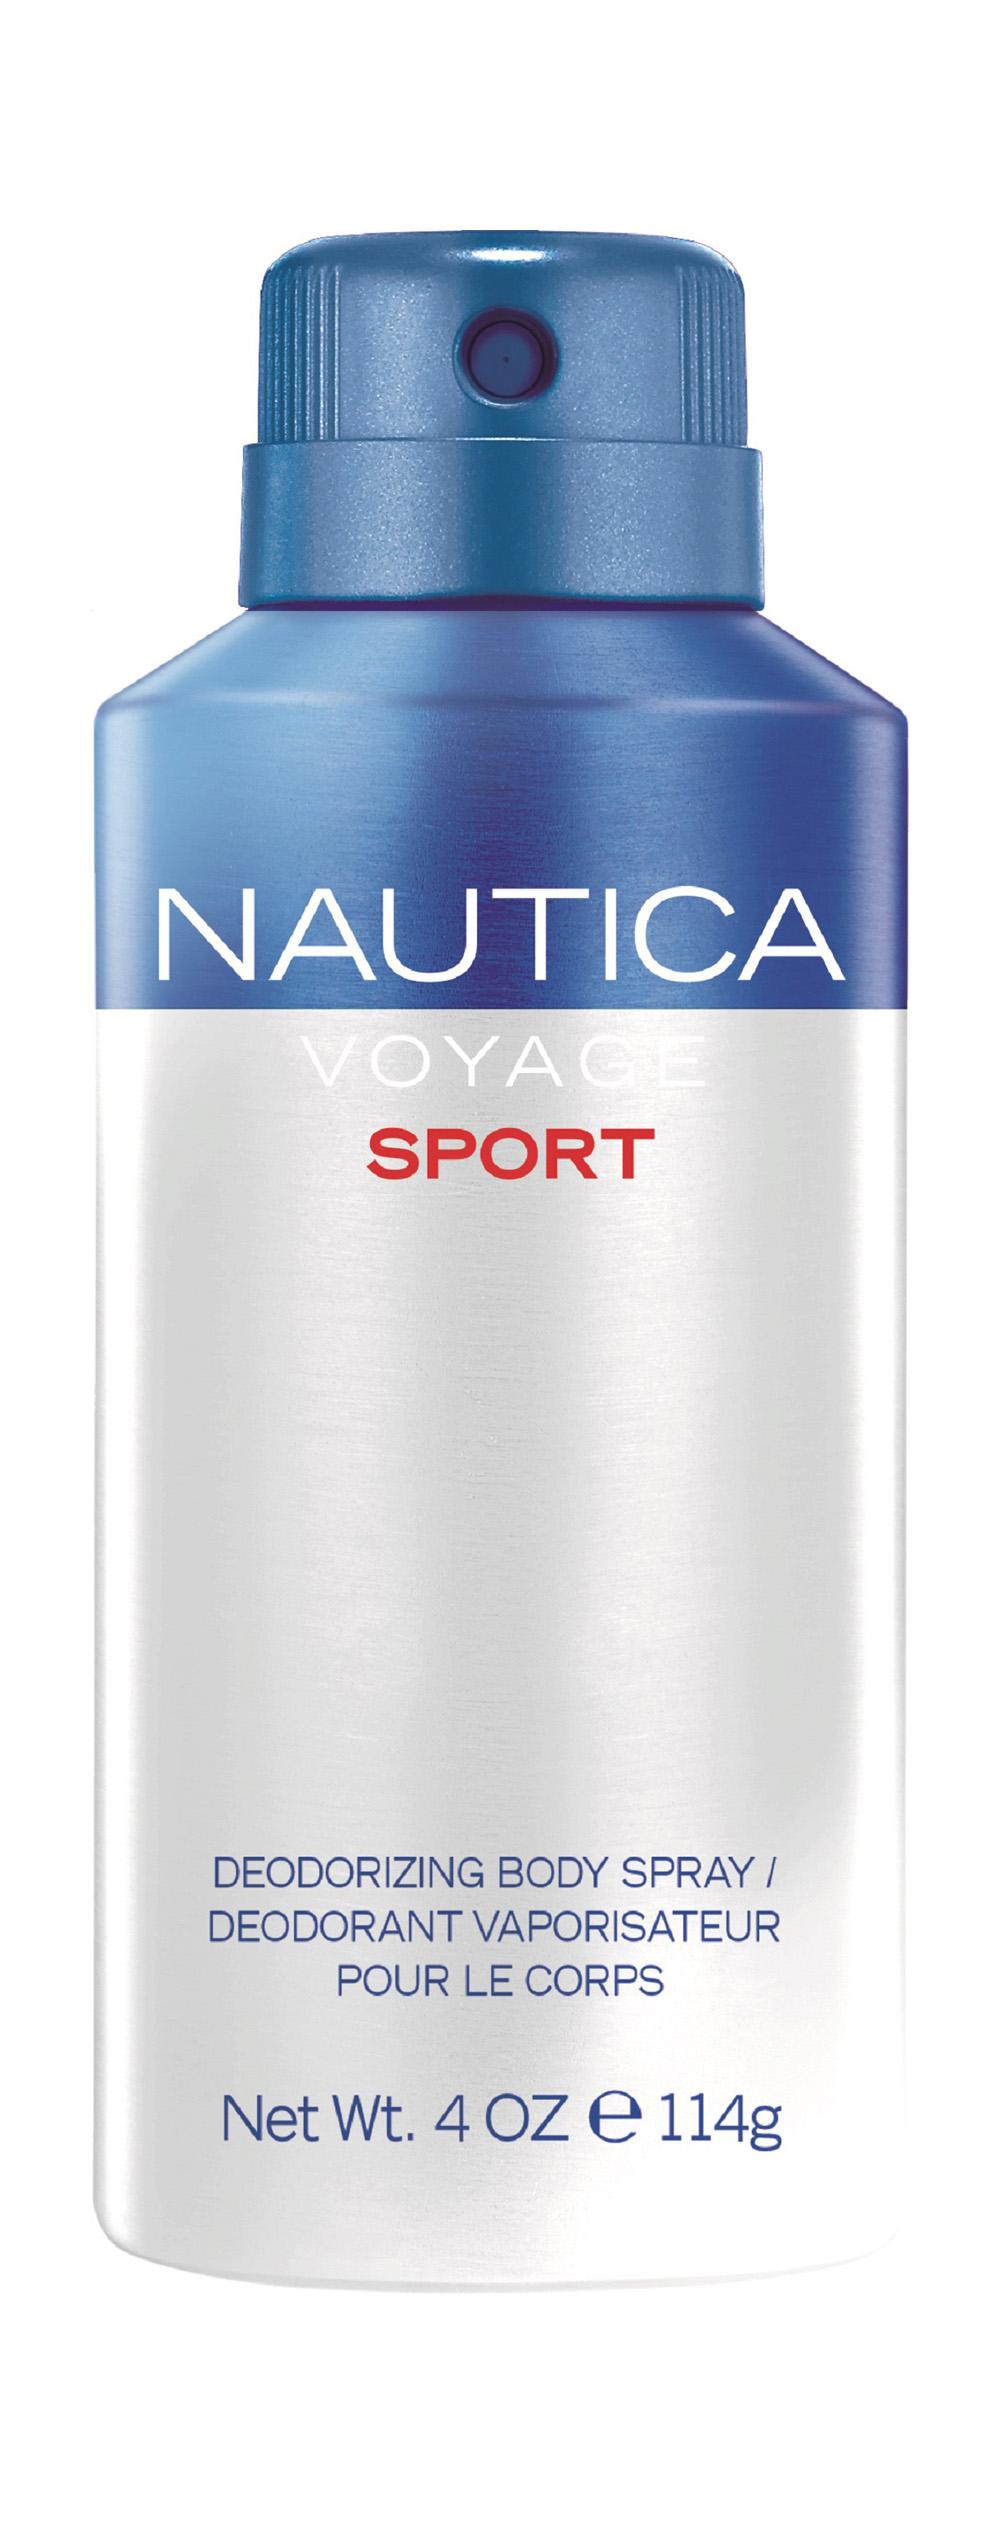 Nautica | Voyage Man Sport Deodorant Spray 150 ML